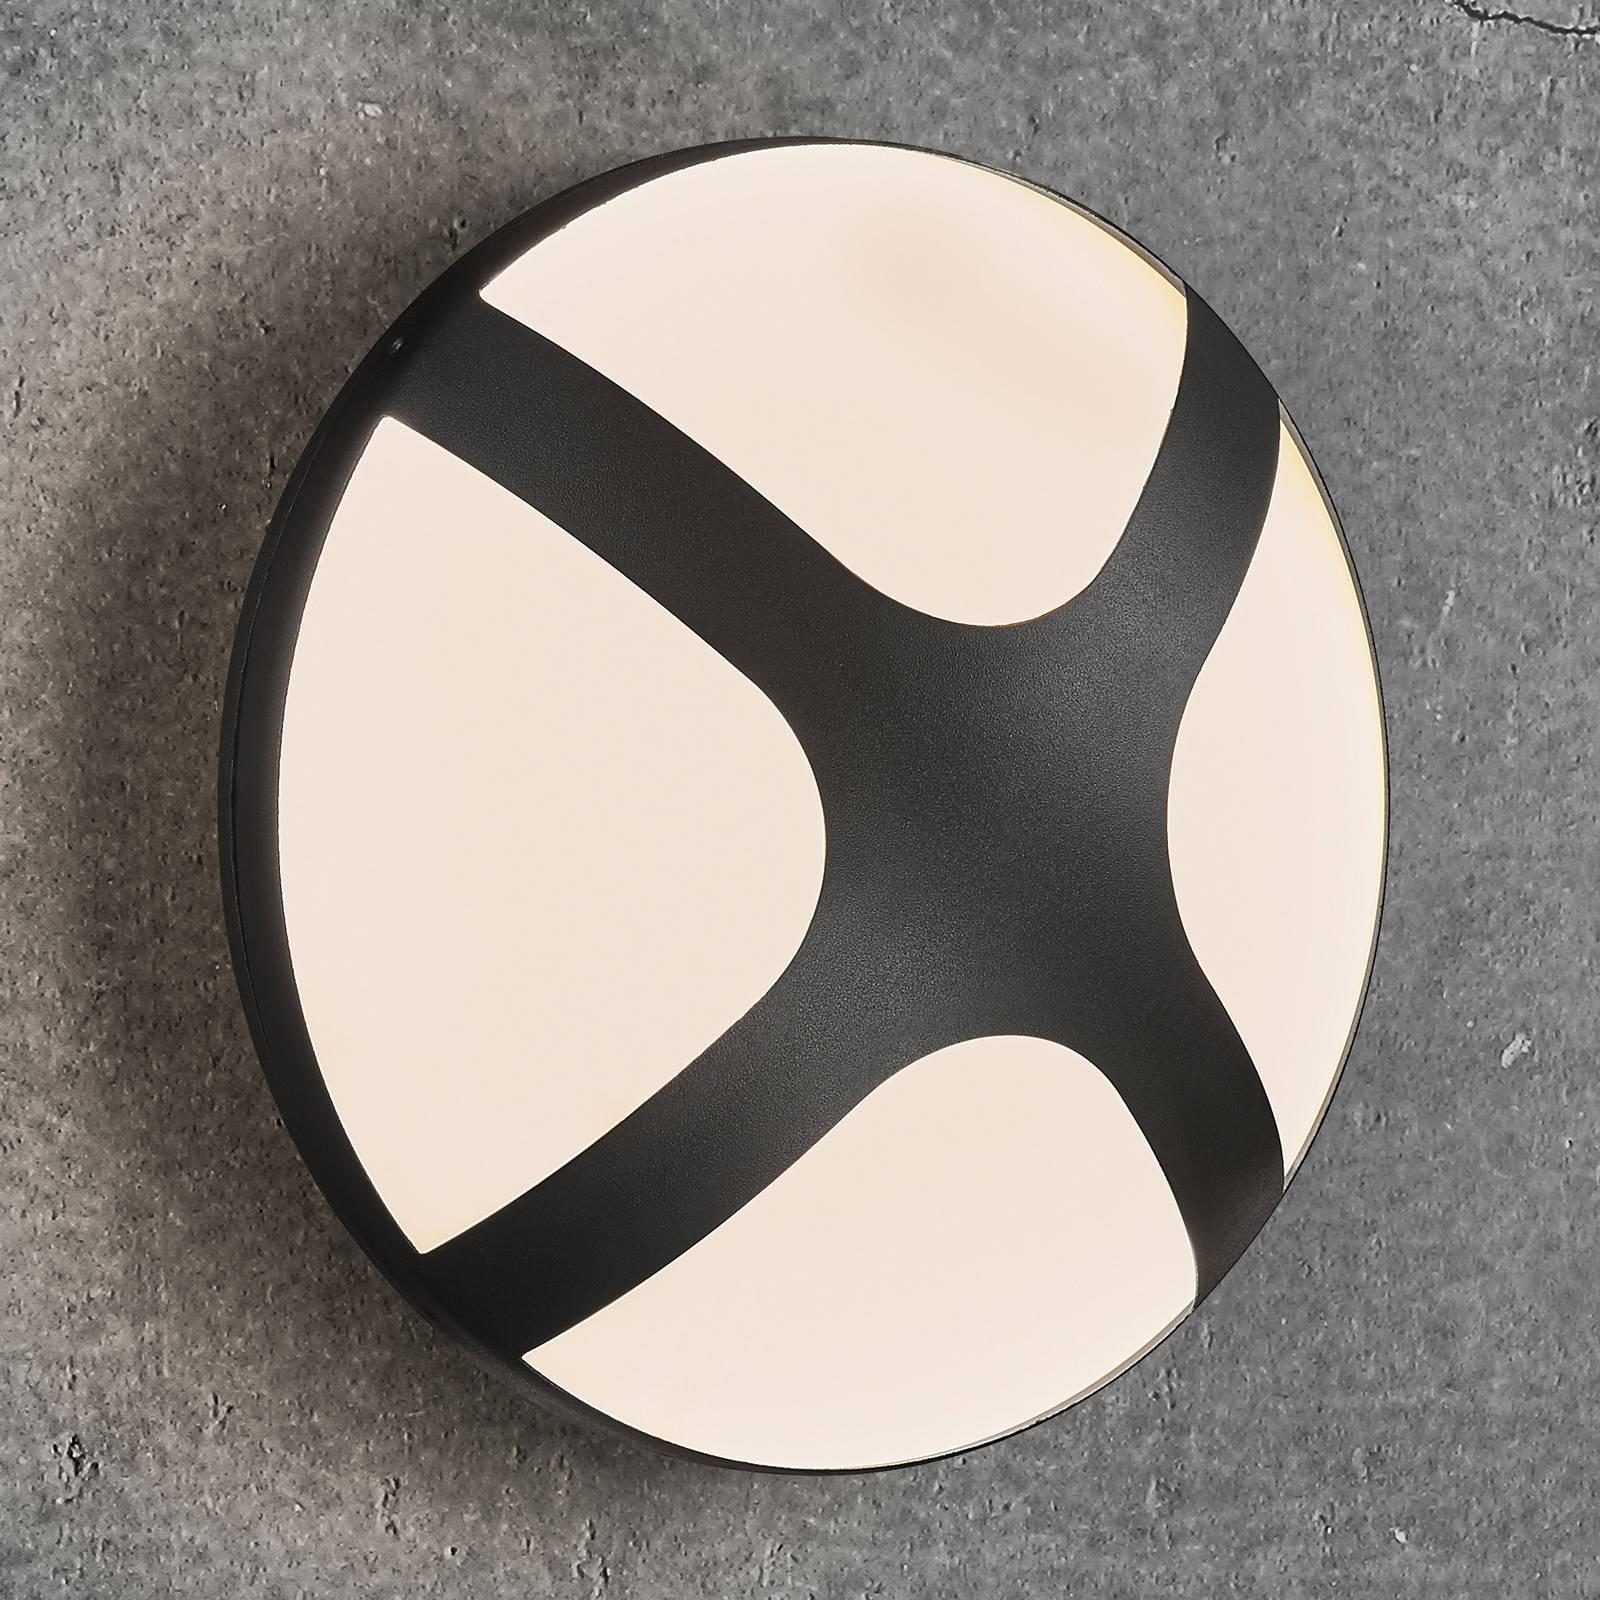 Ulkoseinälamppu Cross, musta, Ø 26 cm